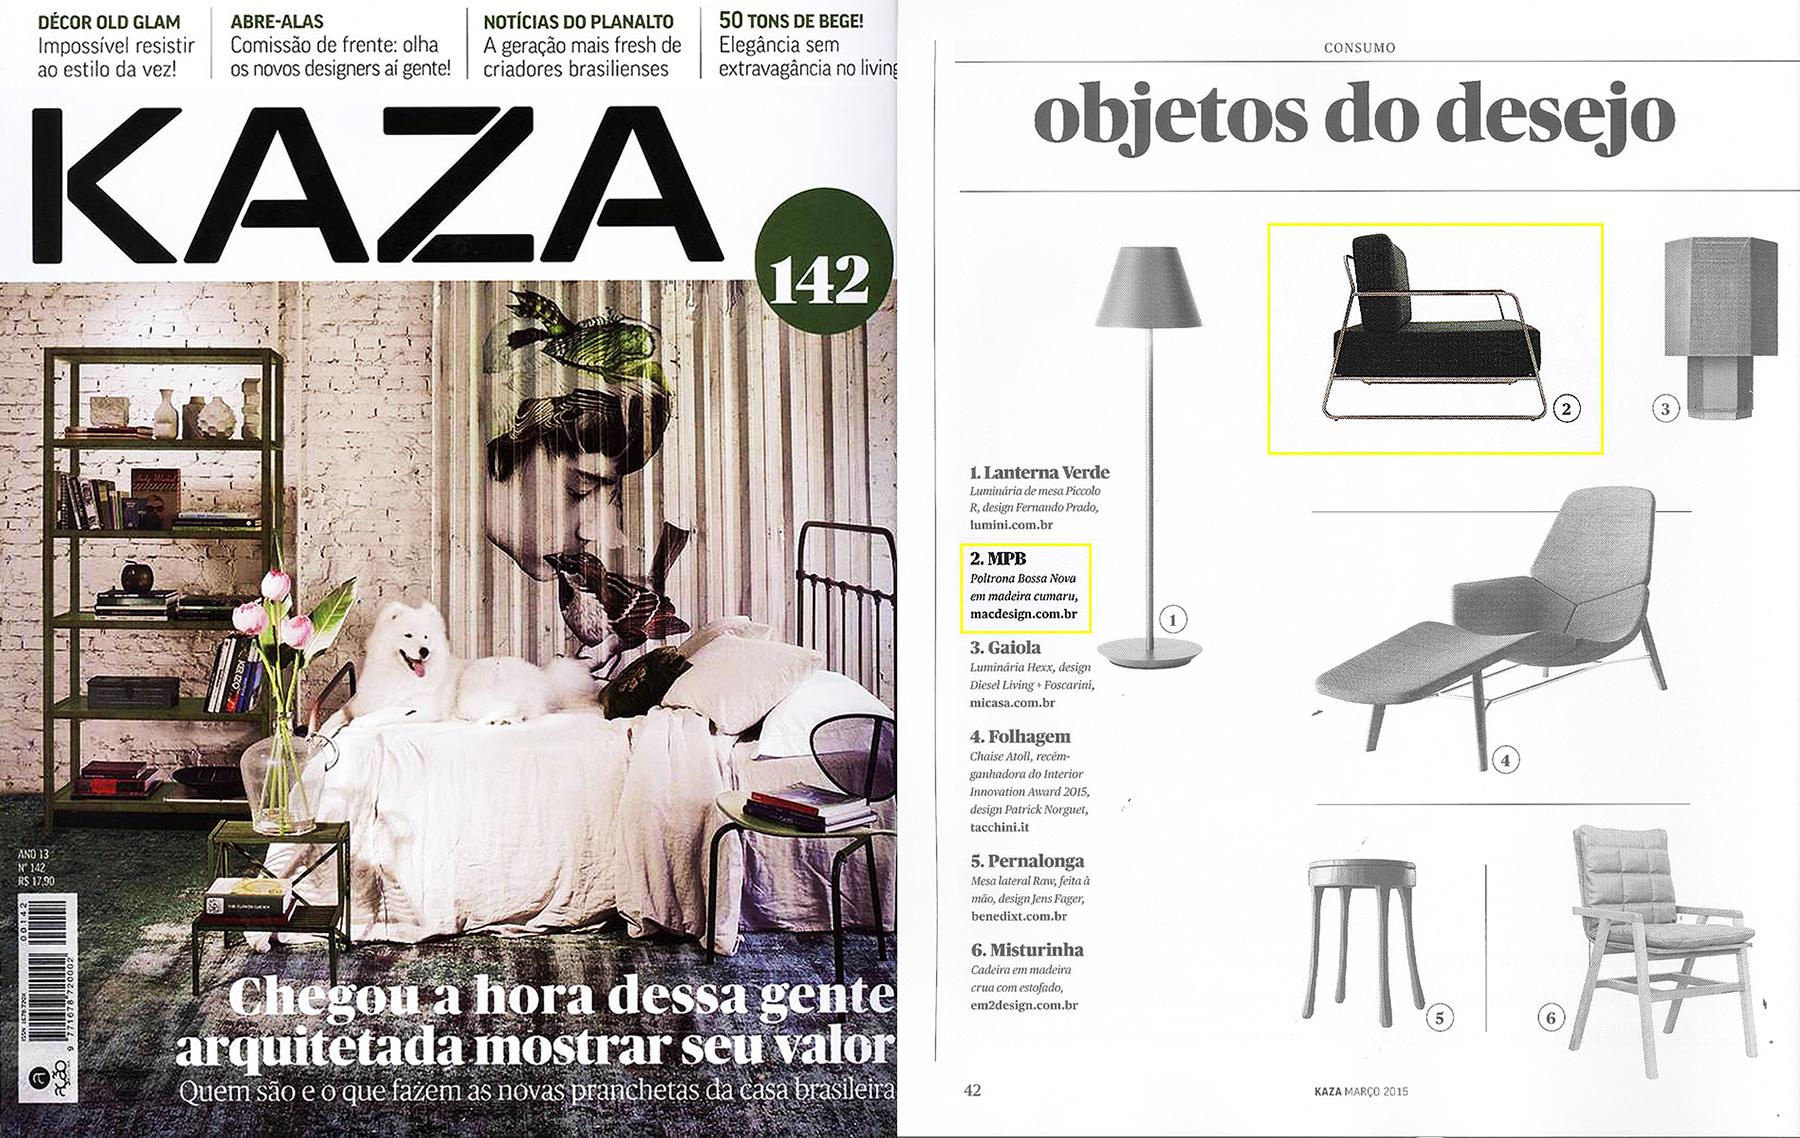 KAZA nº 142 - Marco 2015